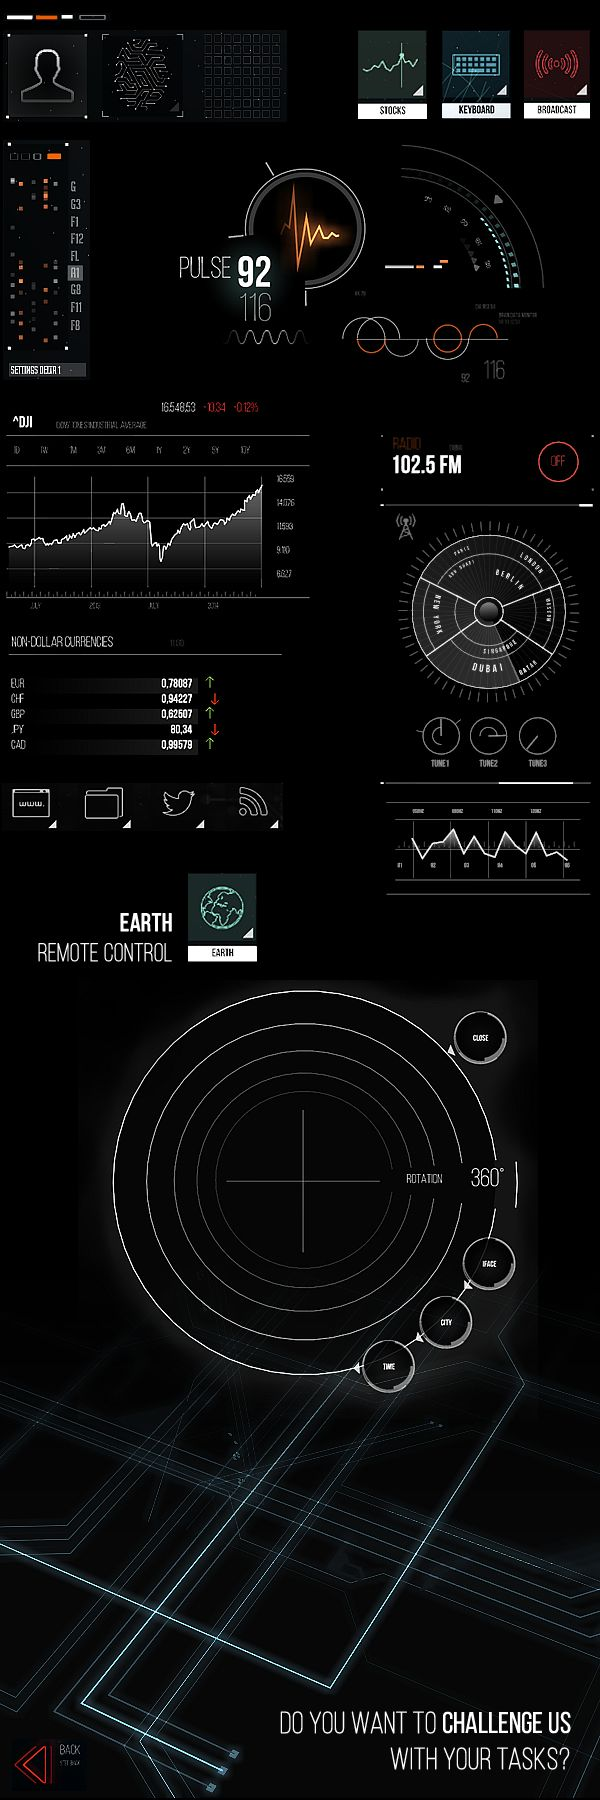 Futuristic UI elements.